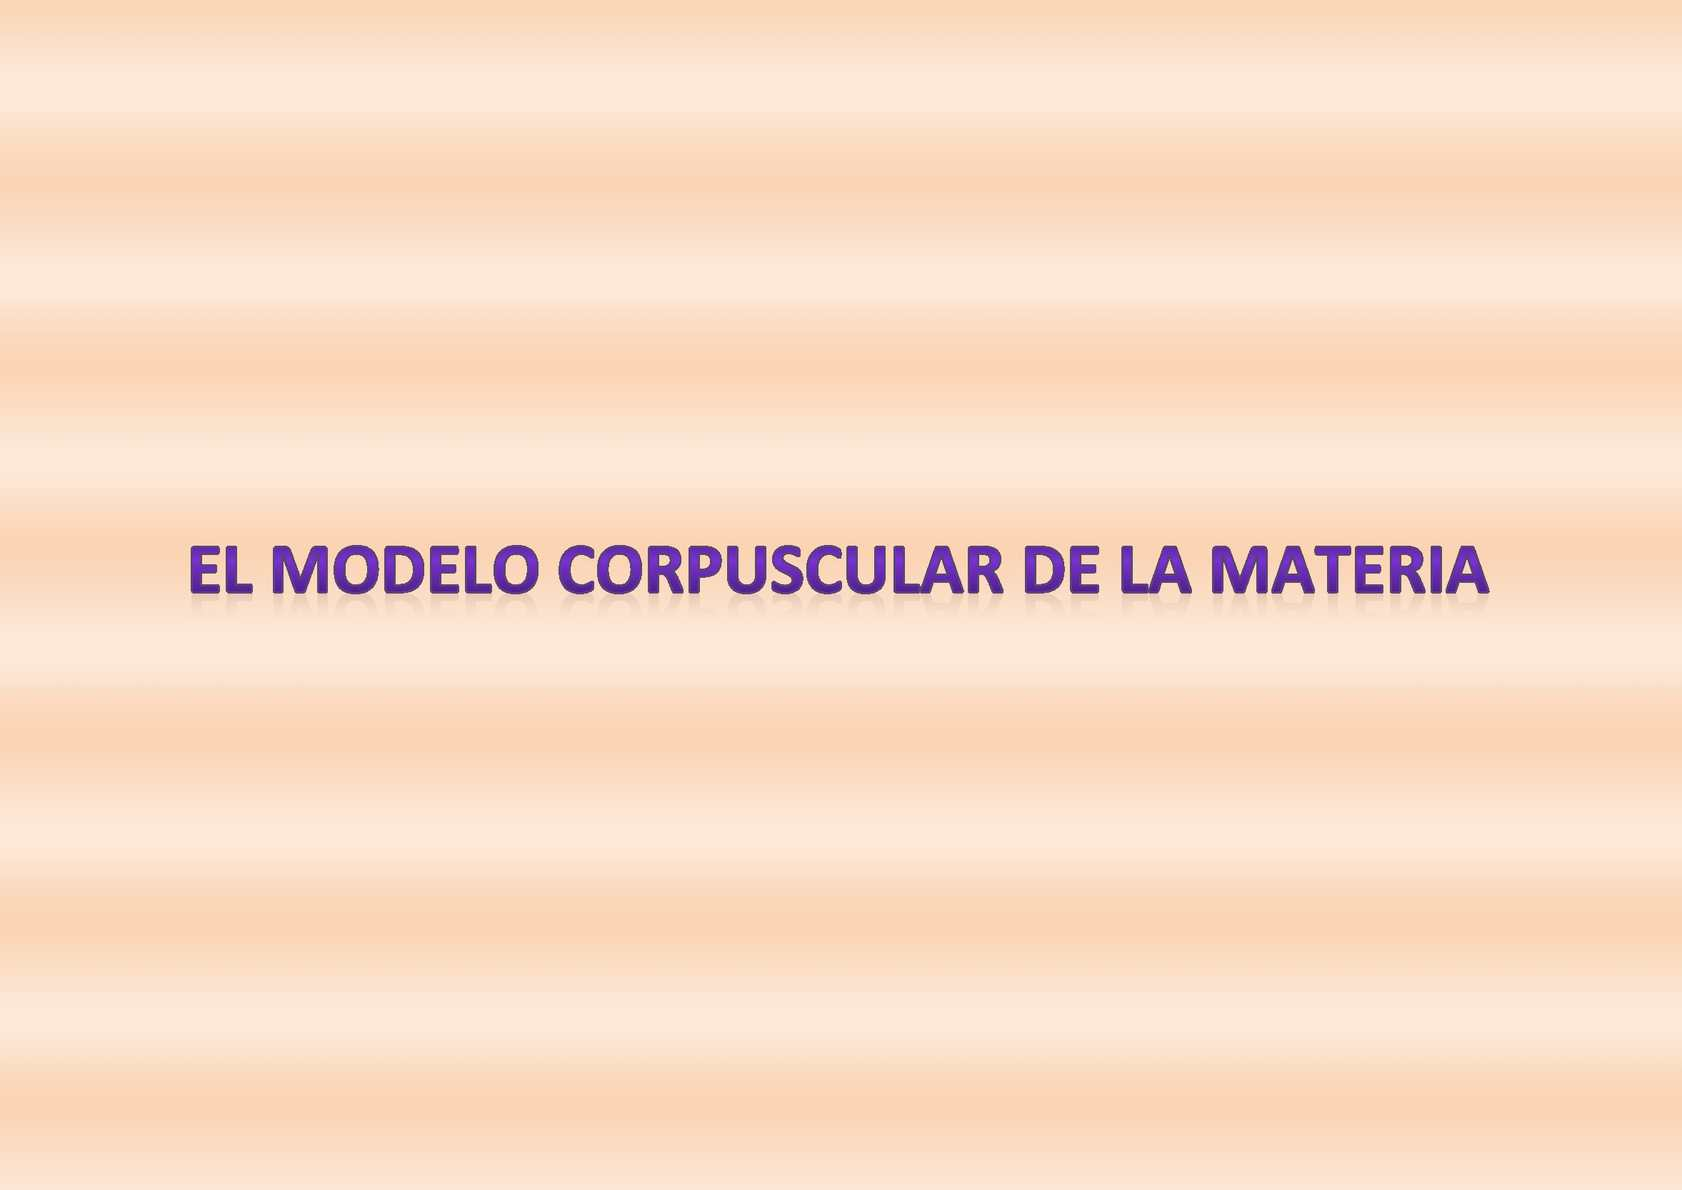 El modelo corpuscular de la materia